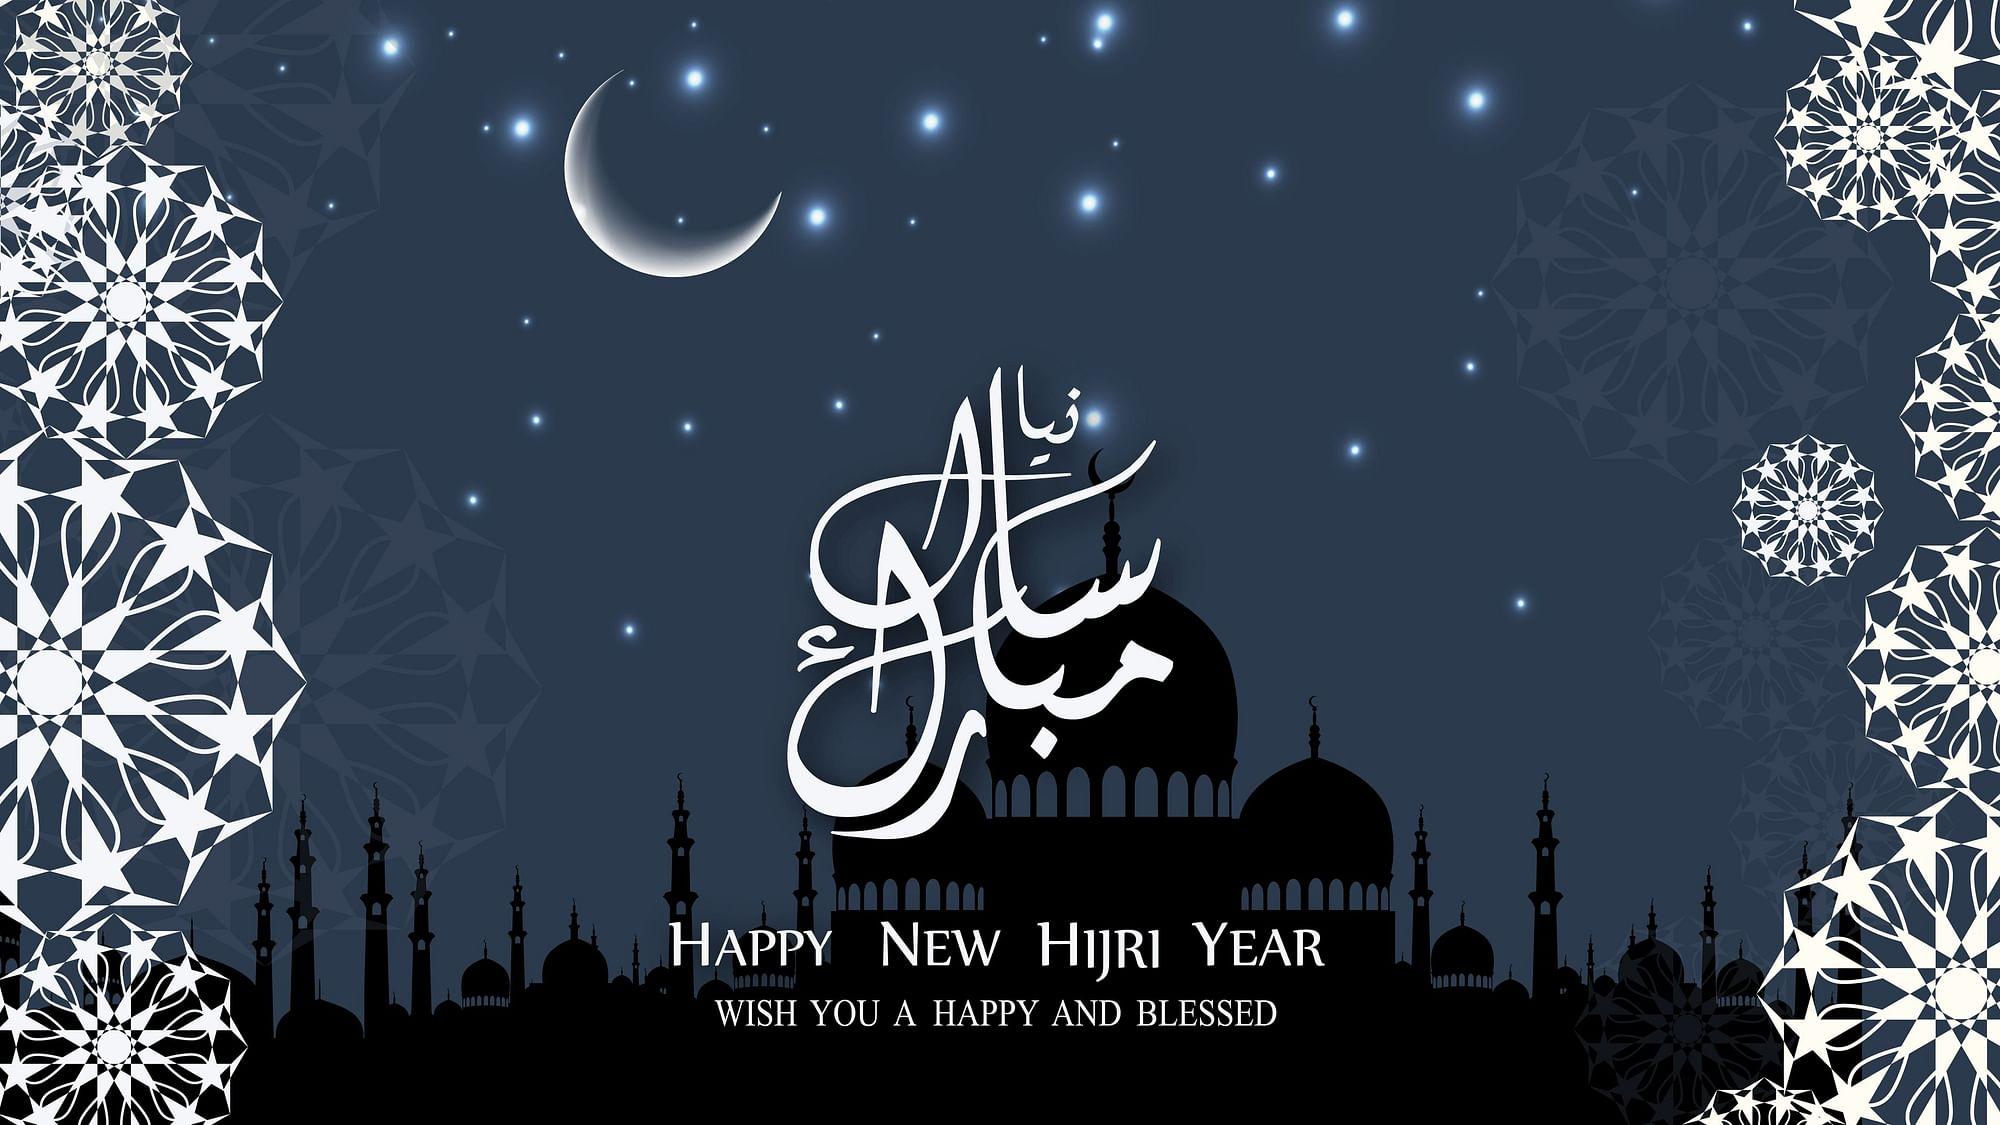 hijri islamic new year greeting in arabic urdu english hindi